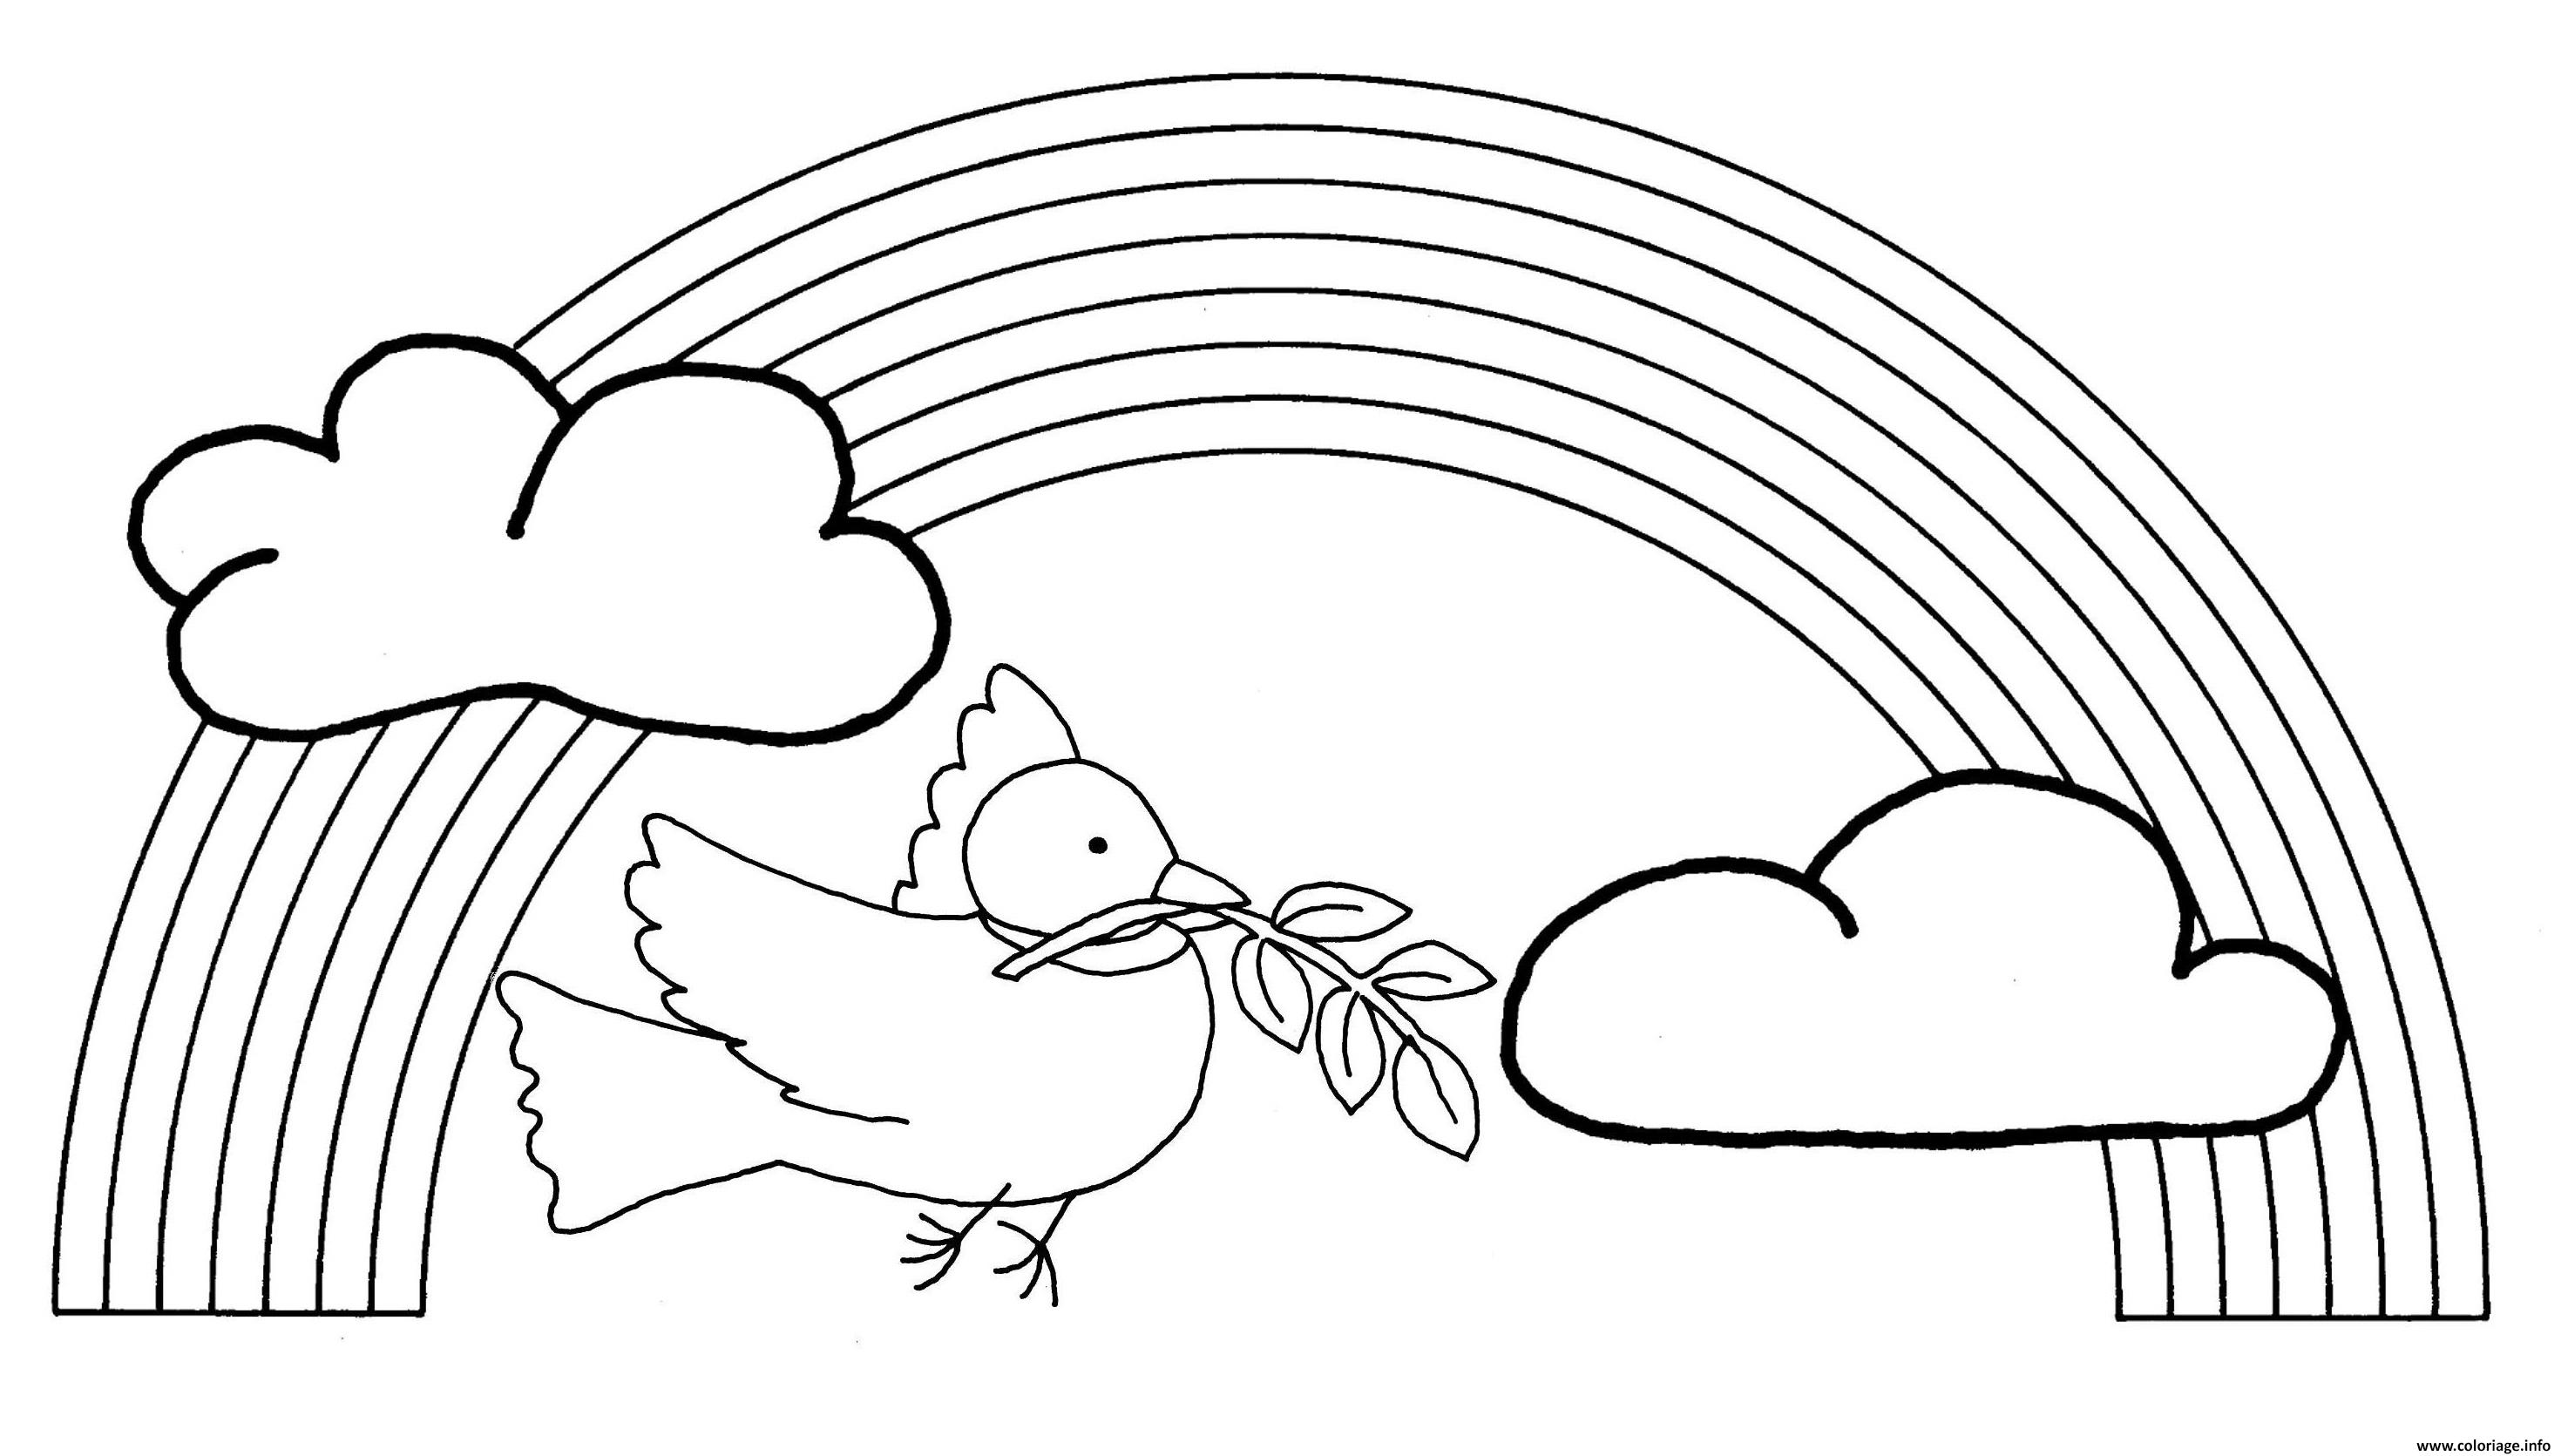 Coloriage Oiseau Arc En Ciel Dessin